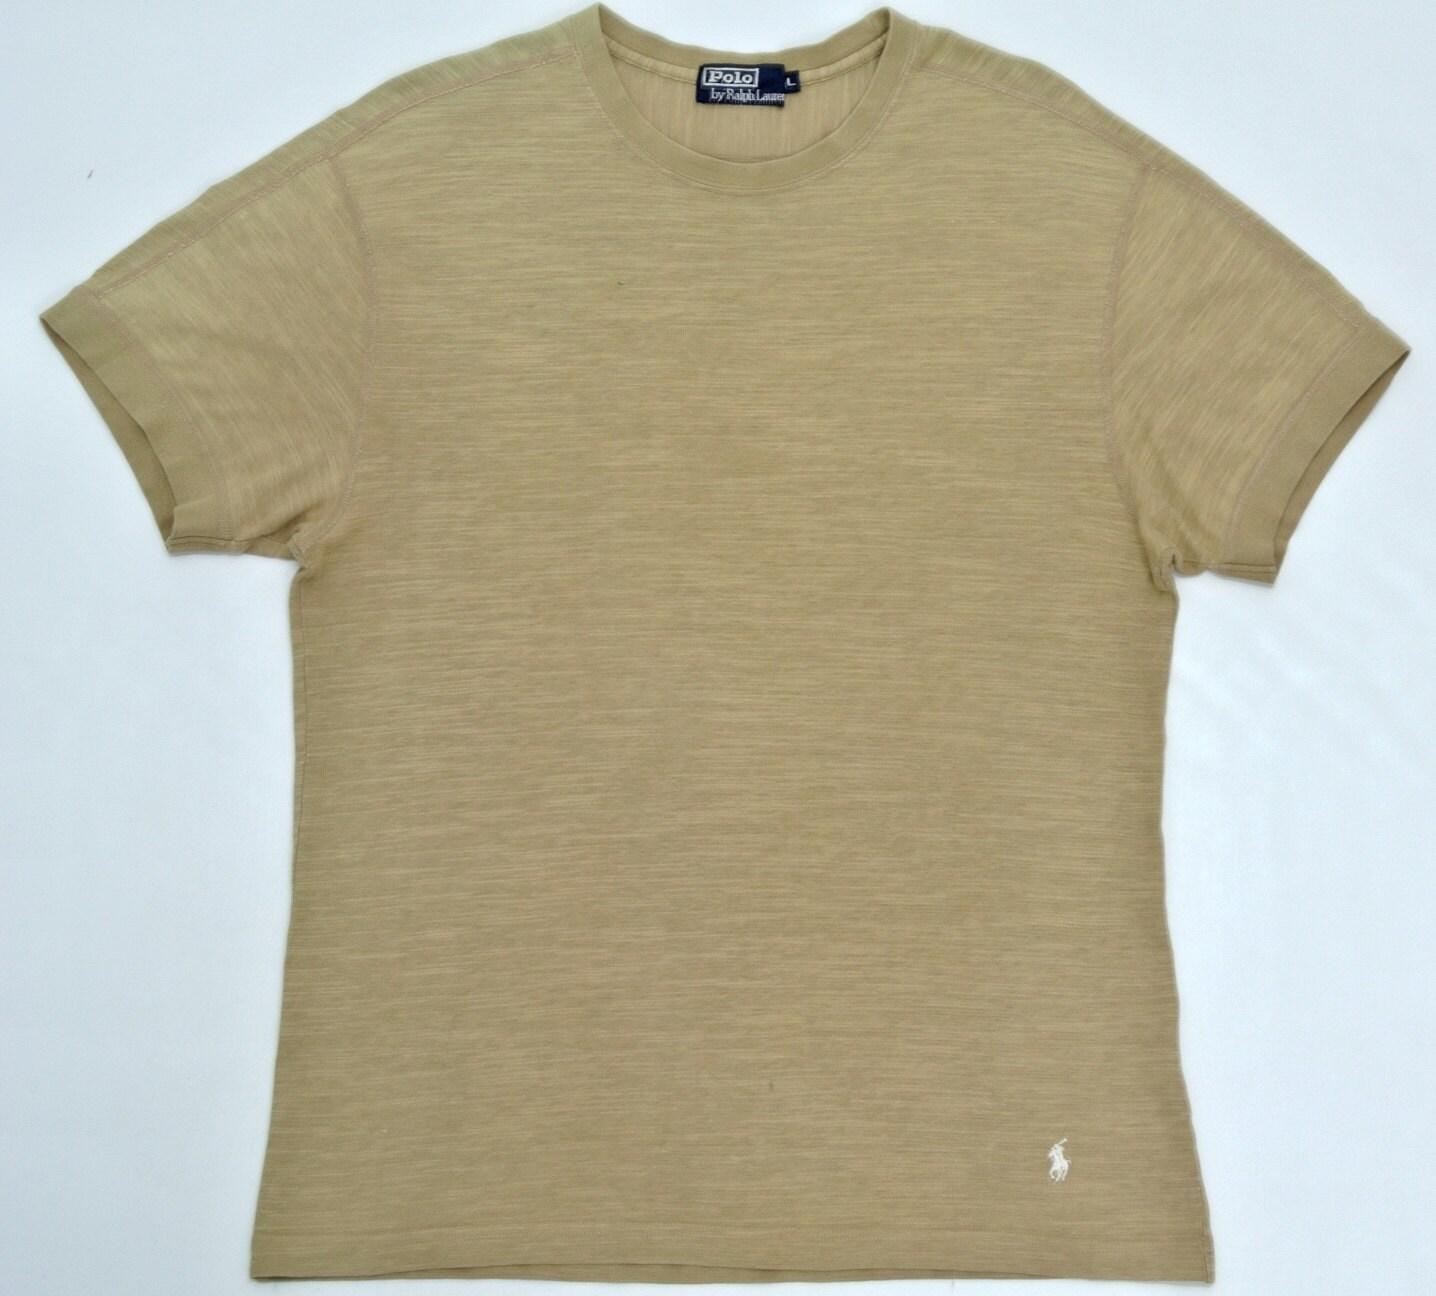 Polo ralph lauren shirt mens large polo plain t ralph lauren for Light brown polo shirt